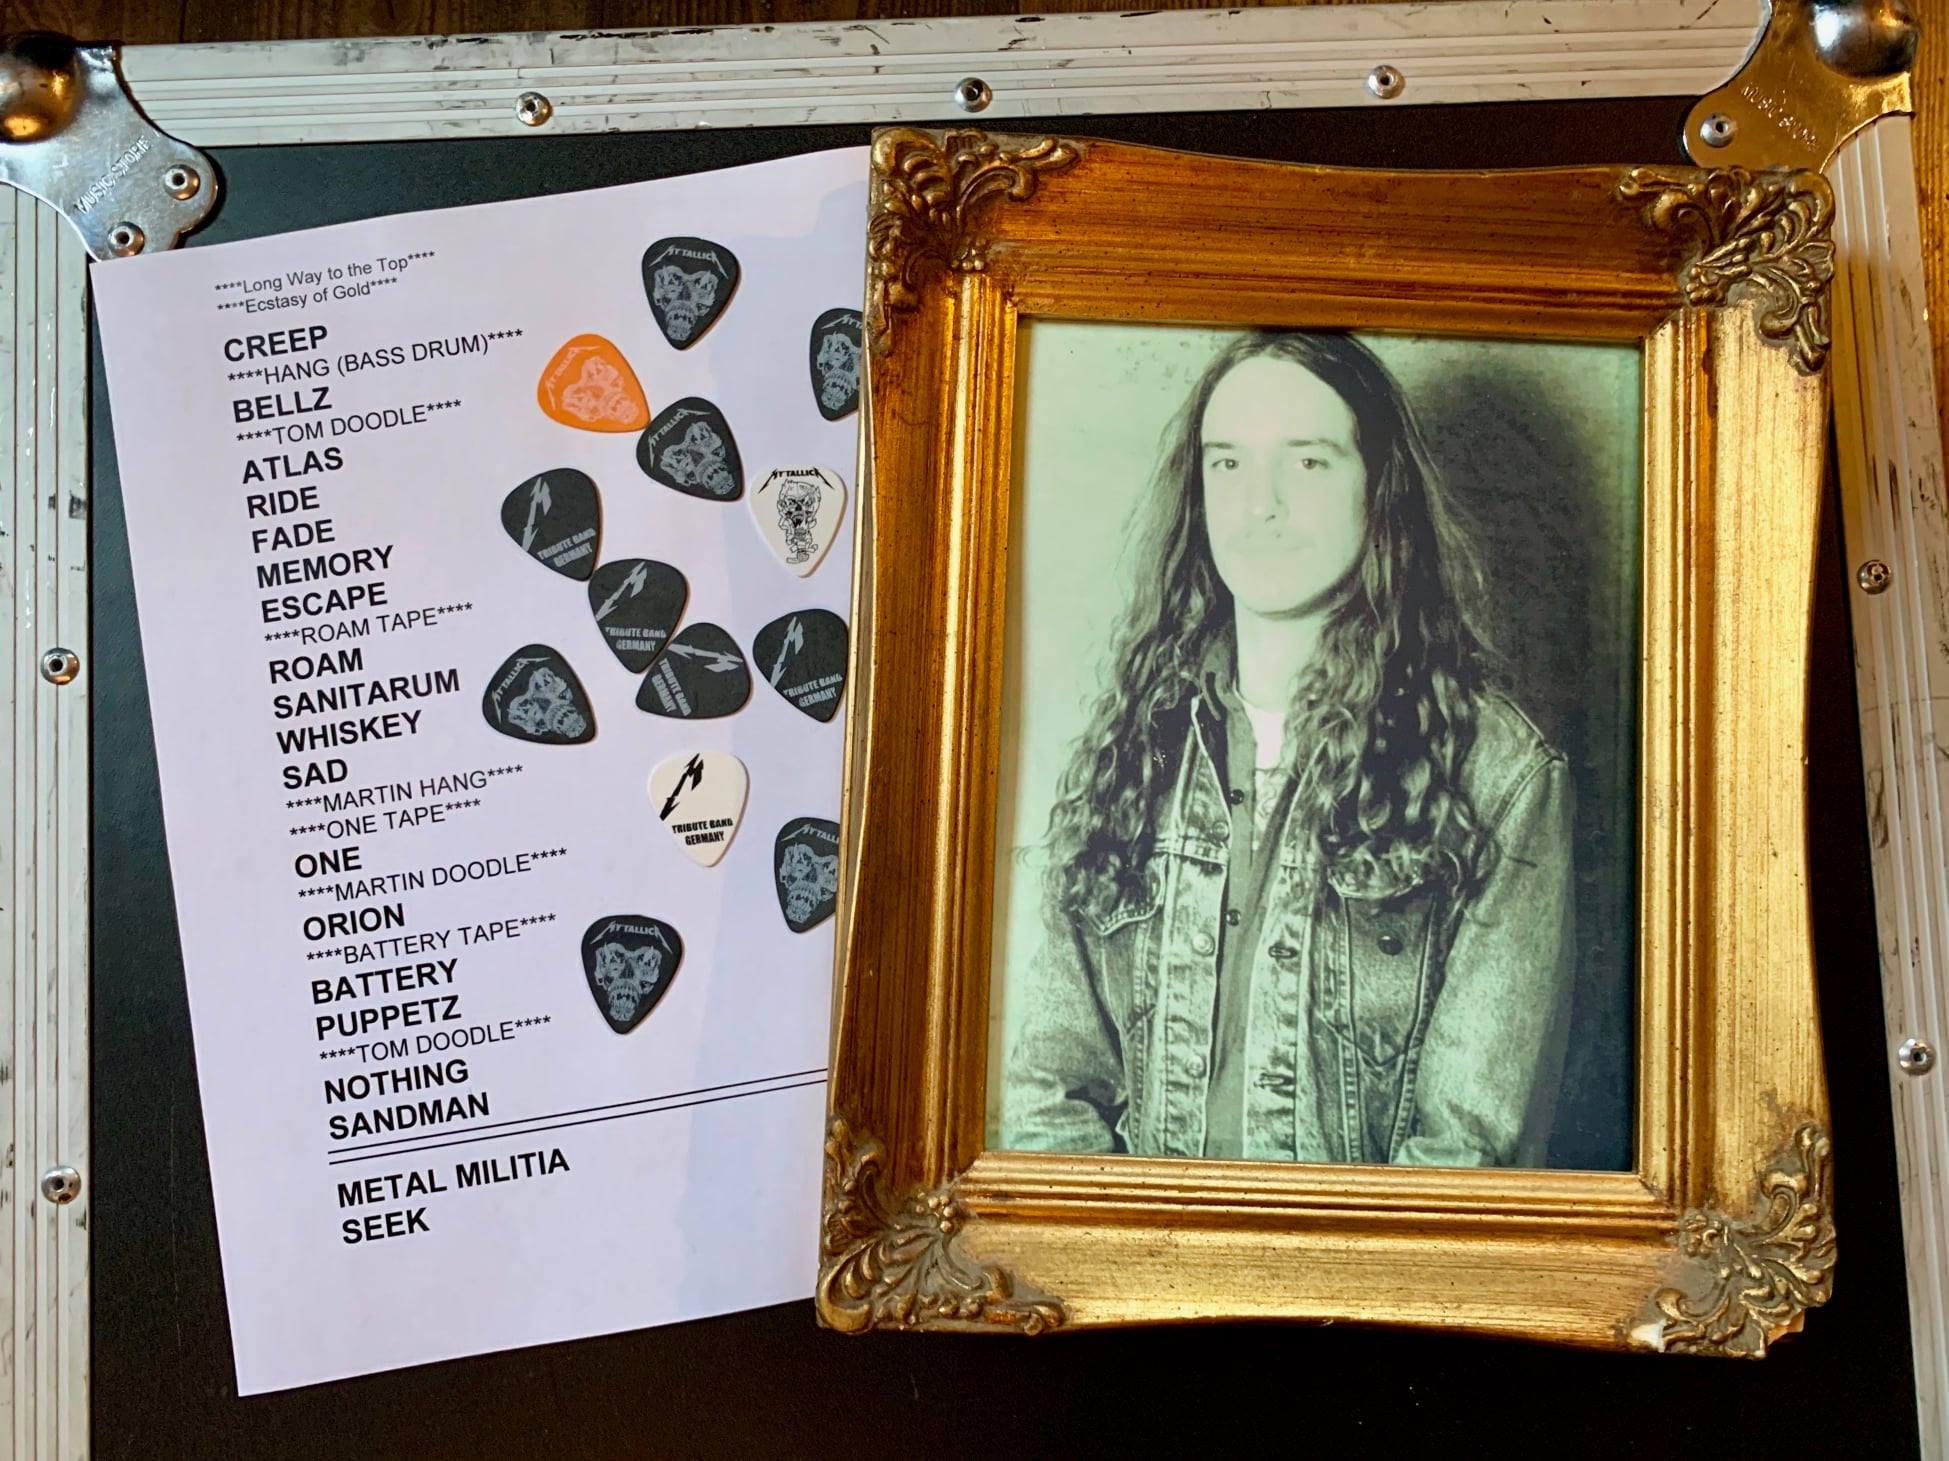 mytallica-setlist-2019-cliff-burton-tribute